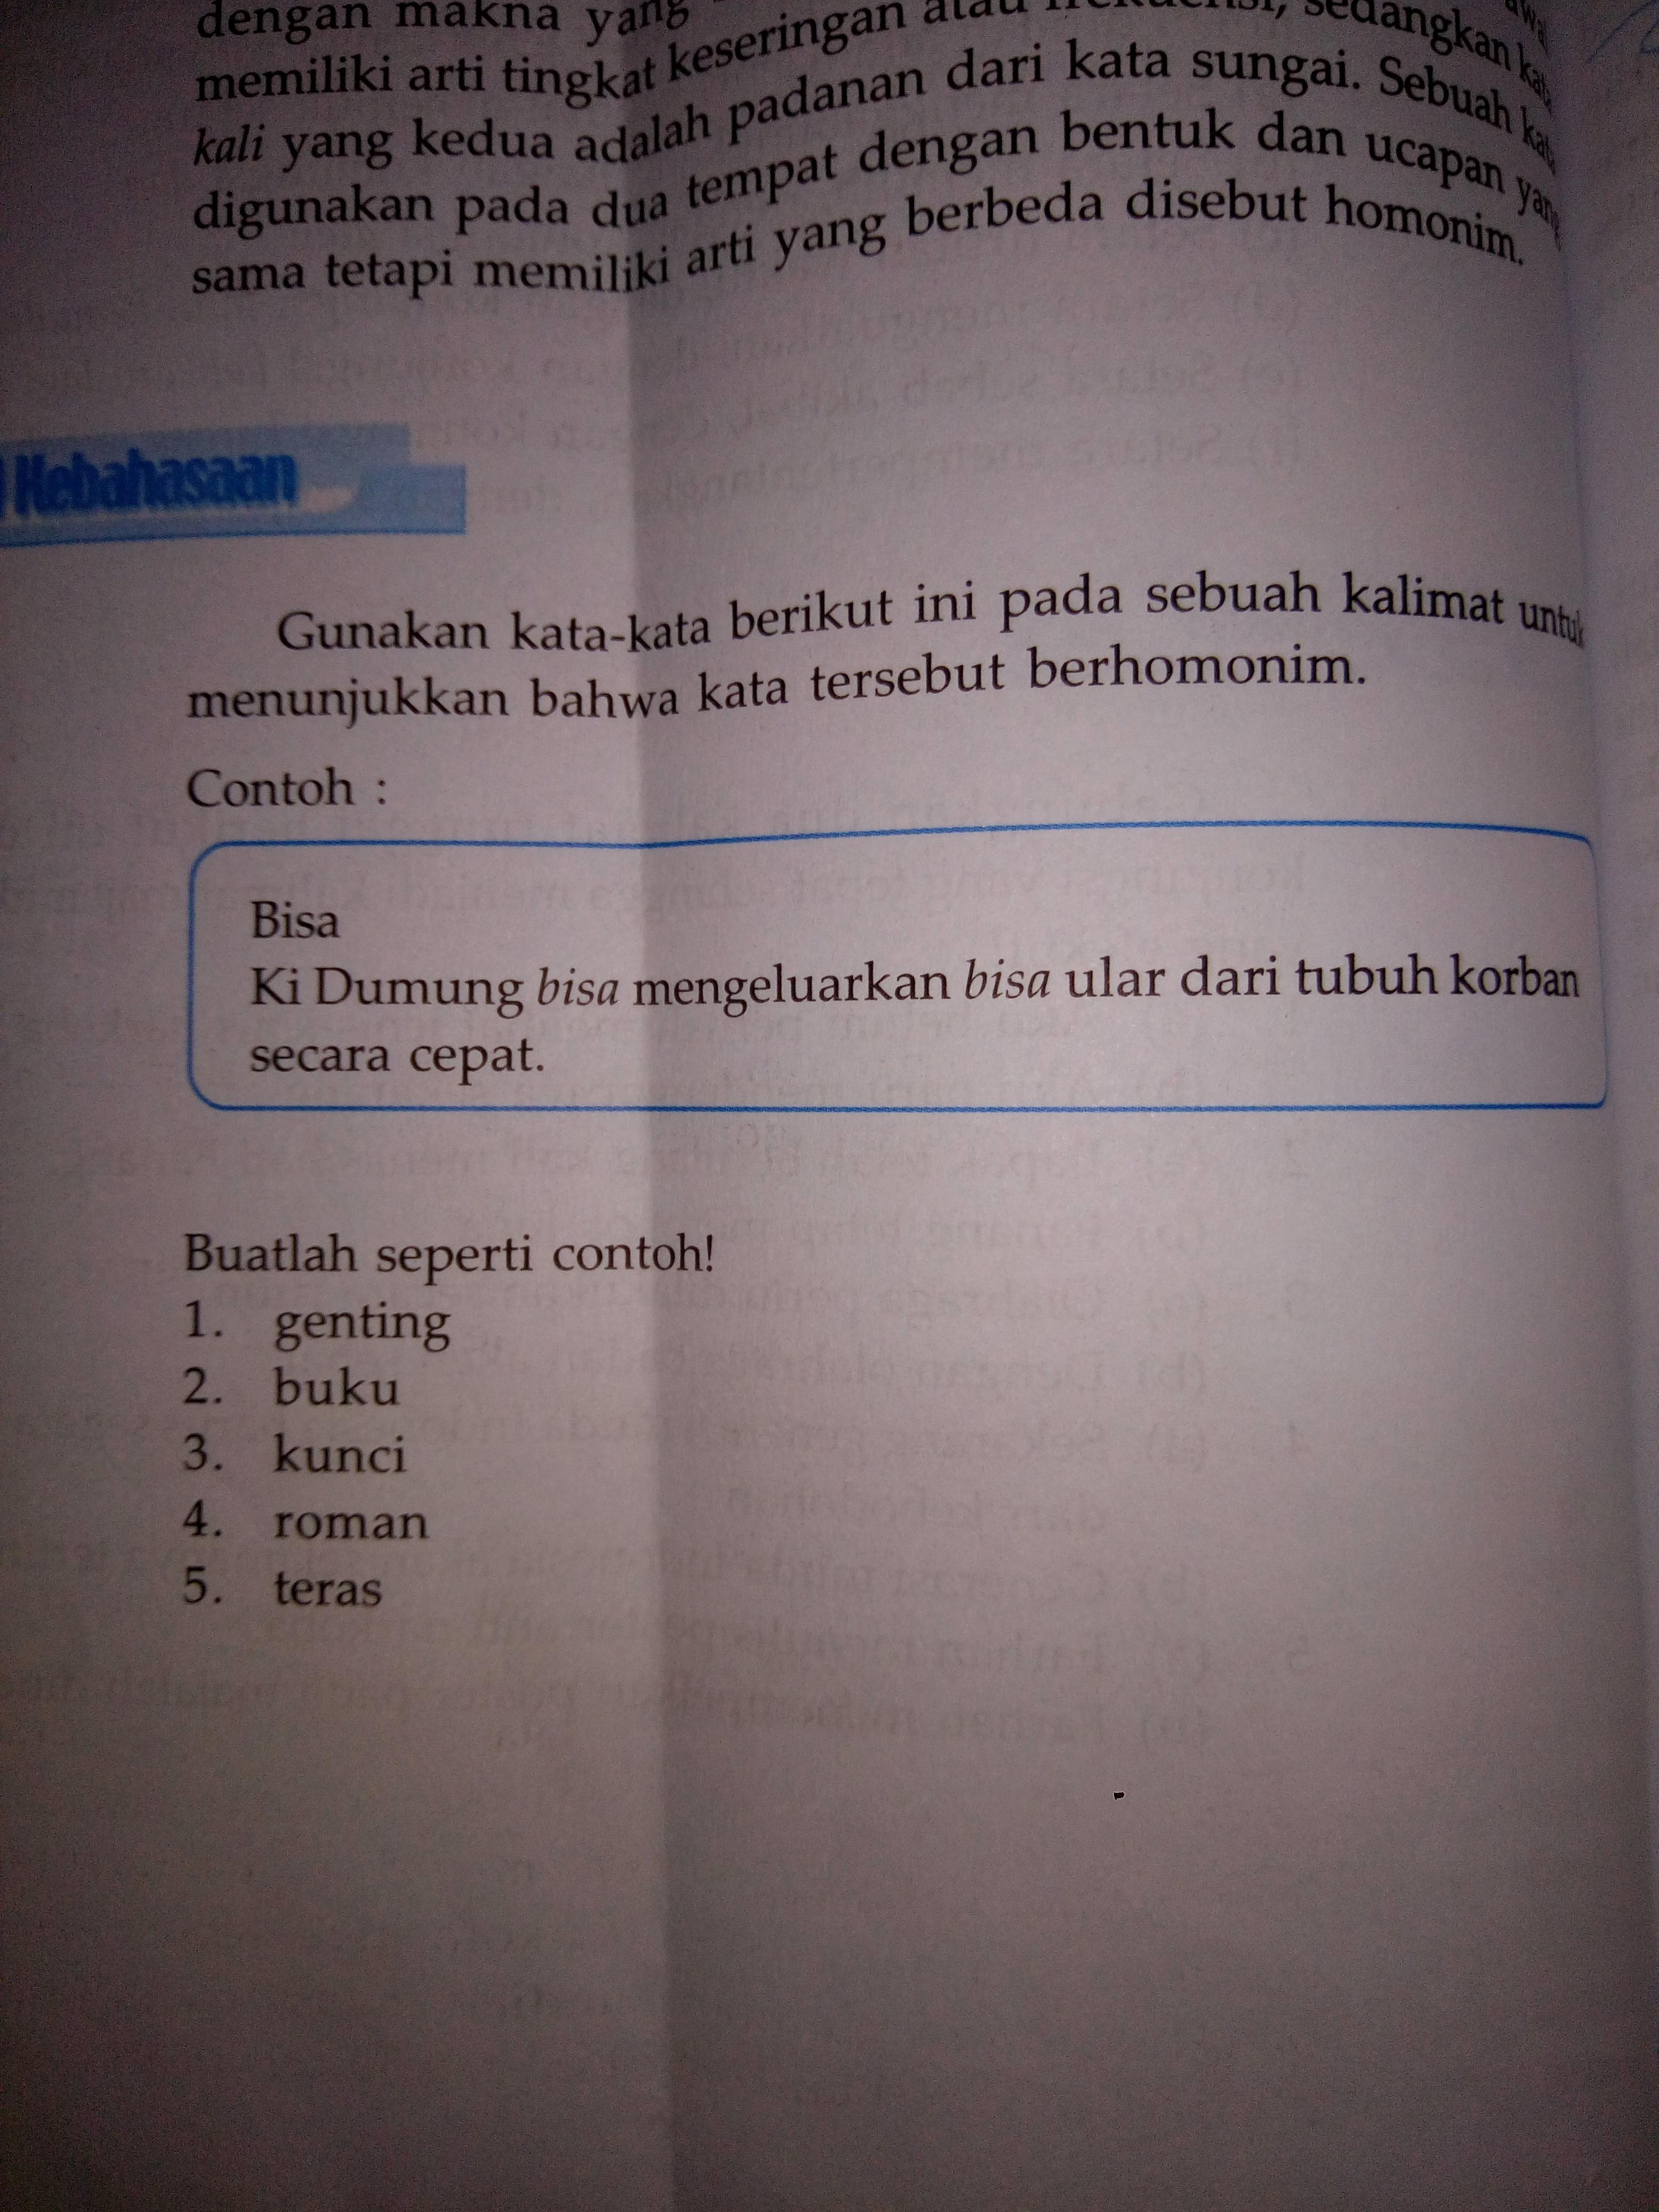 Contoh Kalimat Homonim Genting Buku Kunci Roman Teras Download